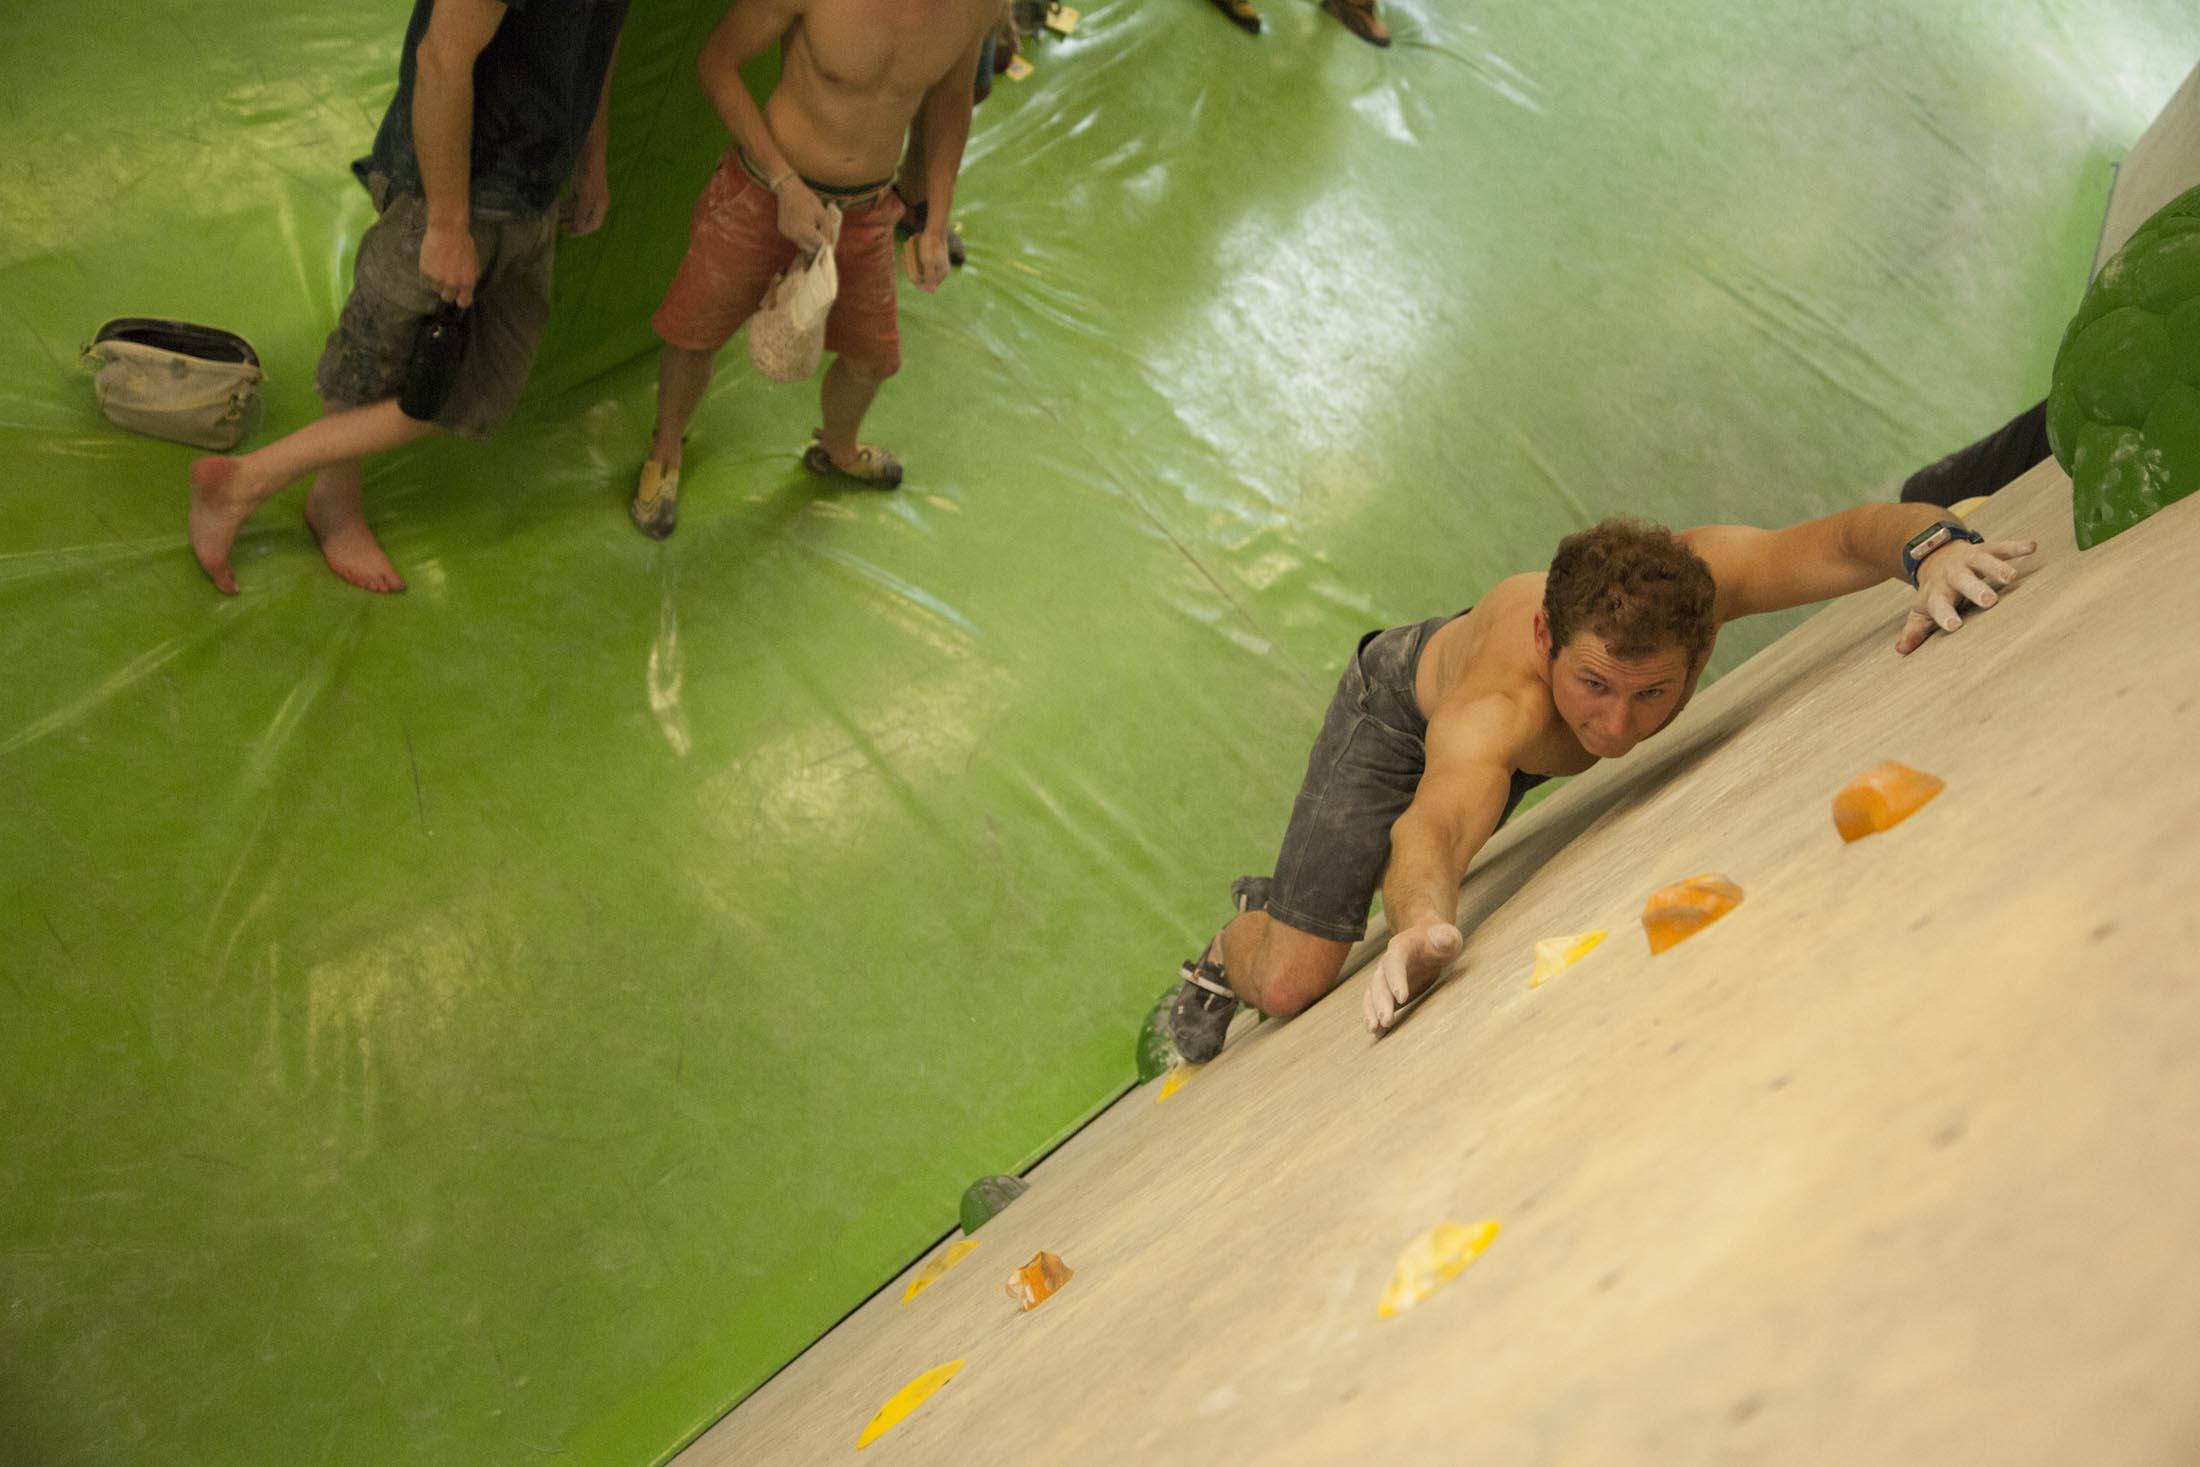 Quali, internationaler bouldercup Frankenjura 2016, BLOCKHELDEN Erlangen, Mammut, Bergfreunde.de, Boulderwettkampf07092016282